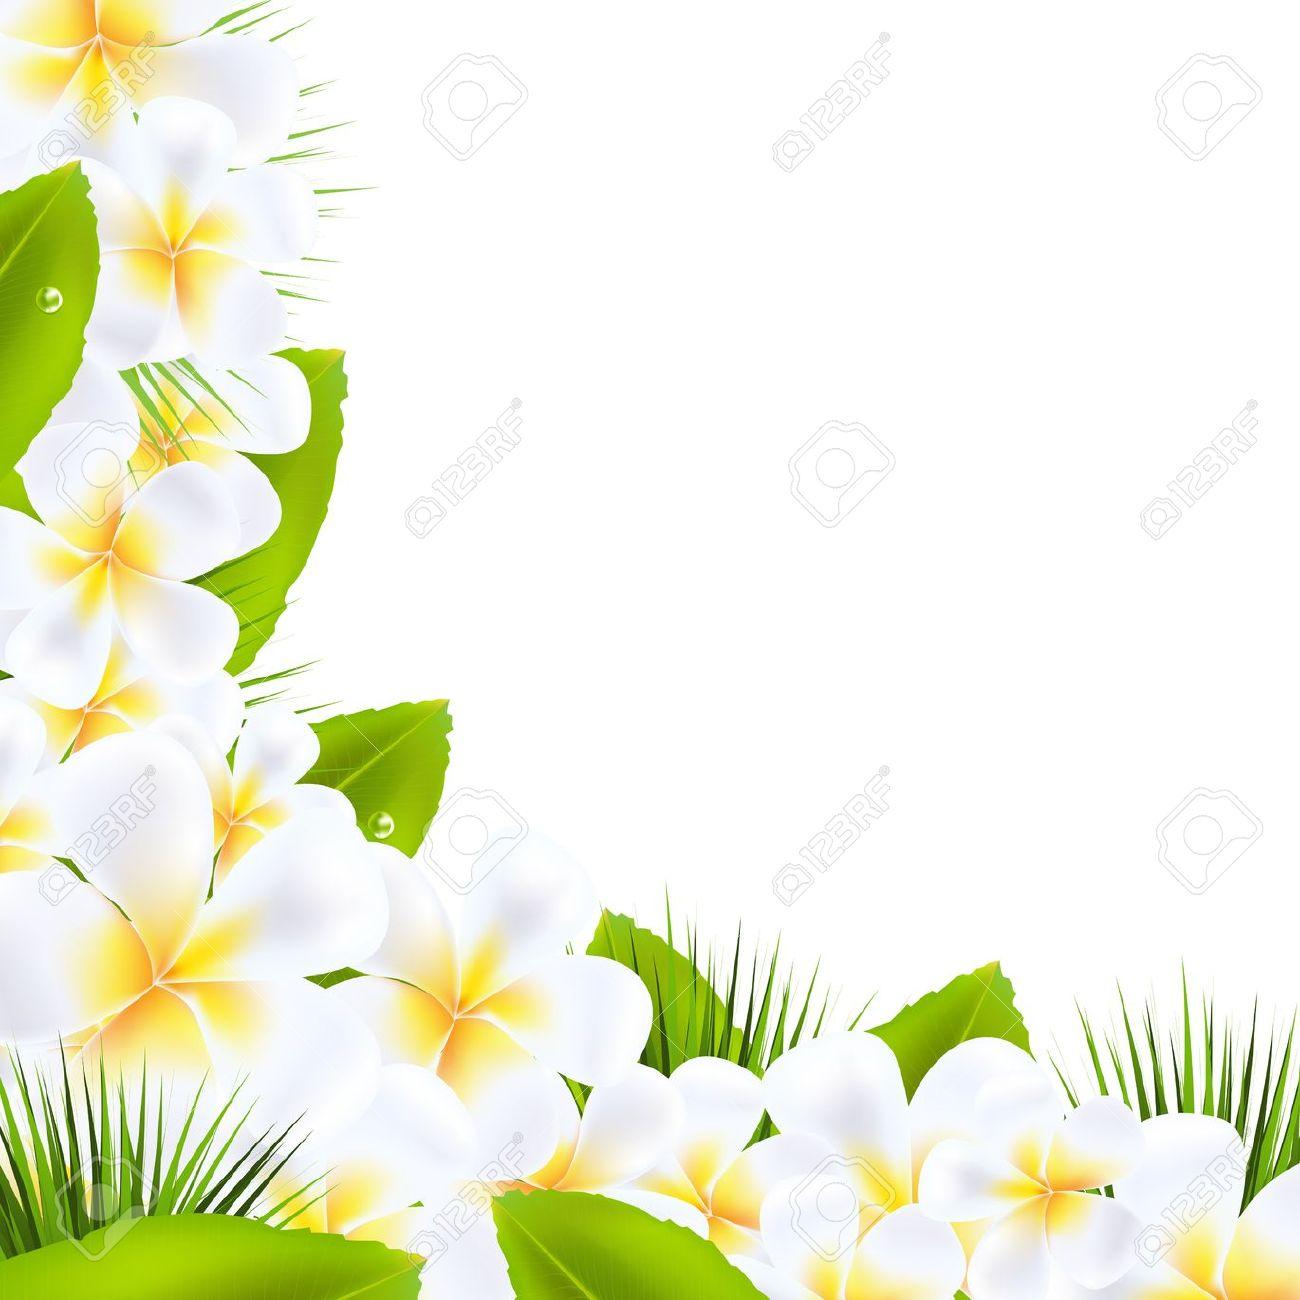 Tahiti Flower Clipart.